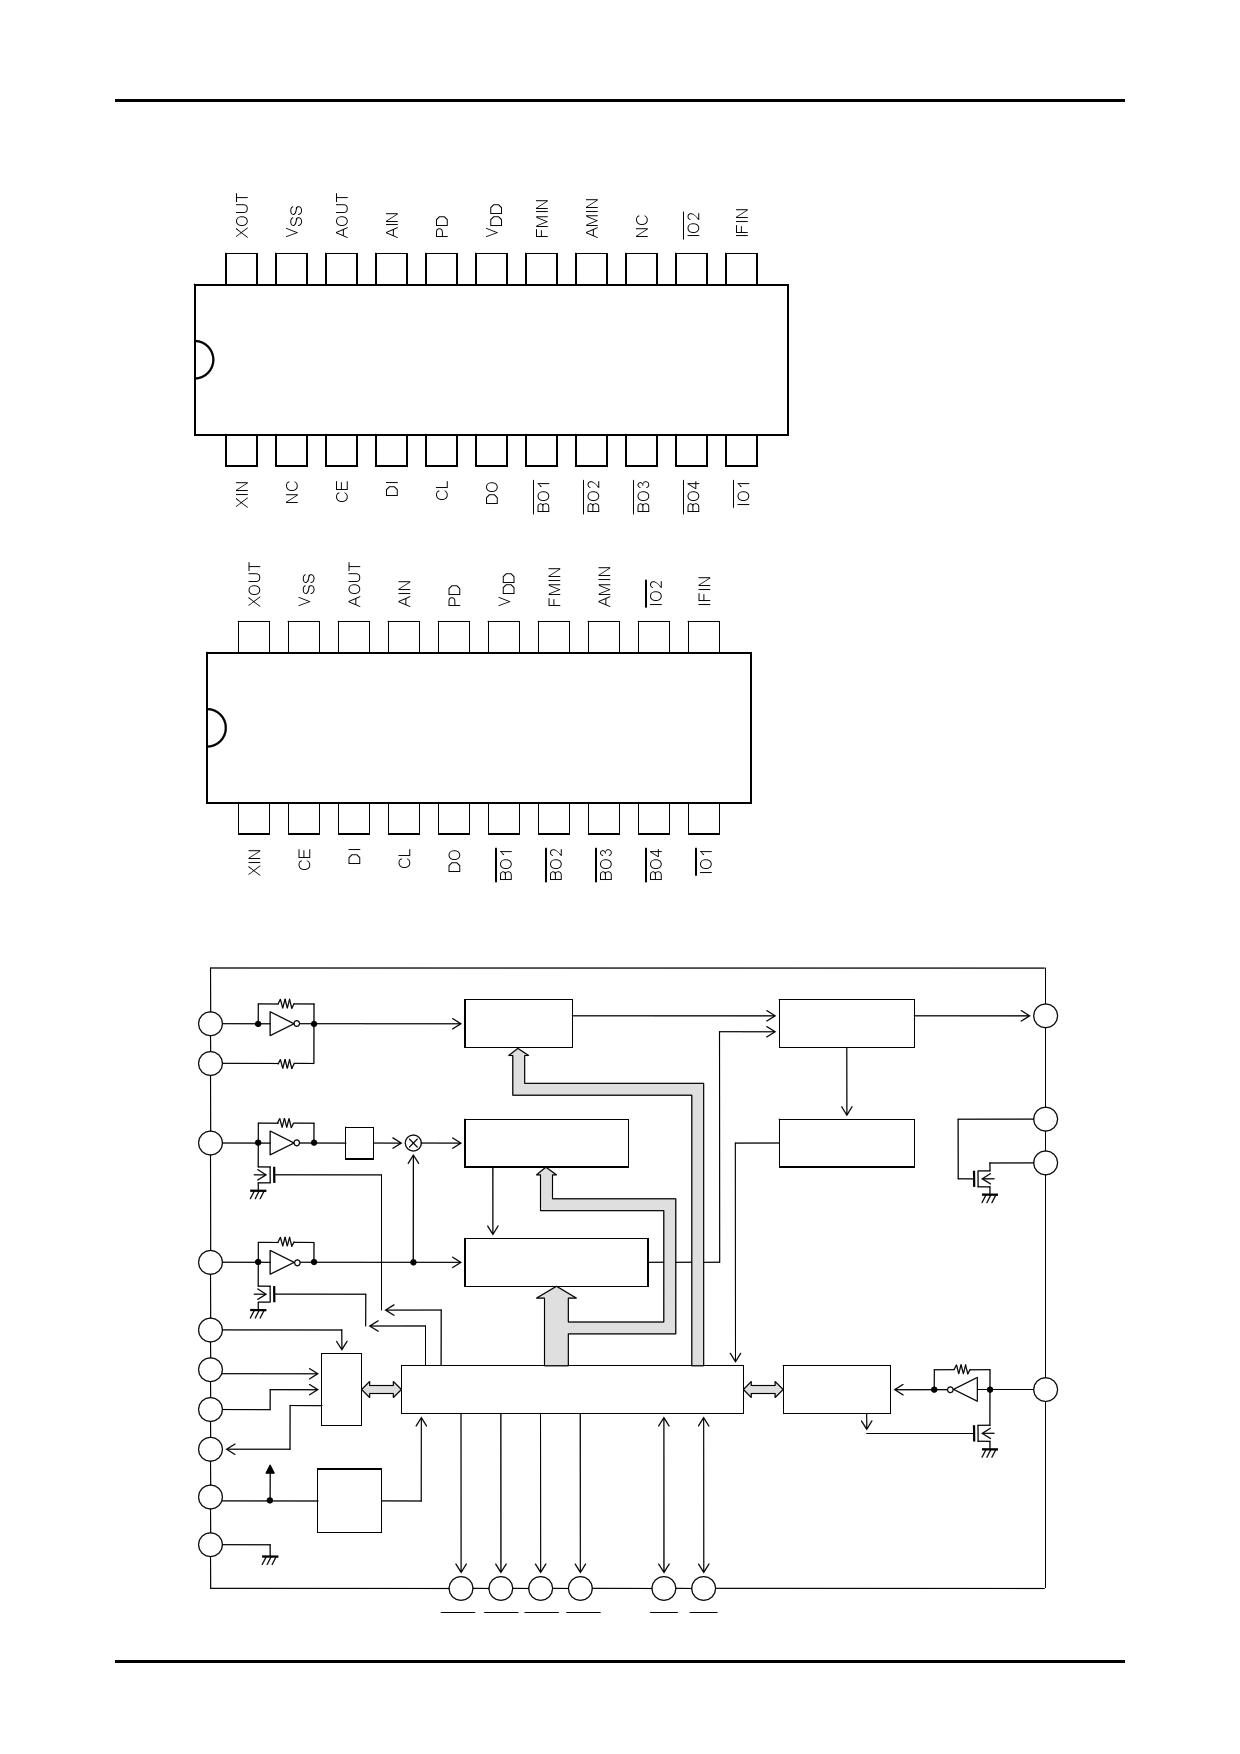 LC72131K 電子部品, 半導体